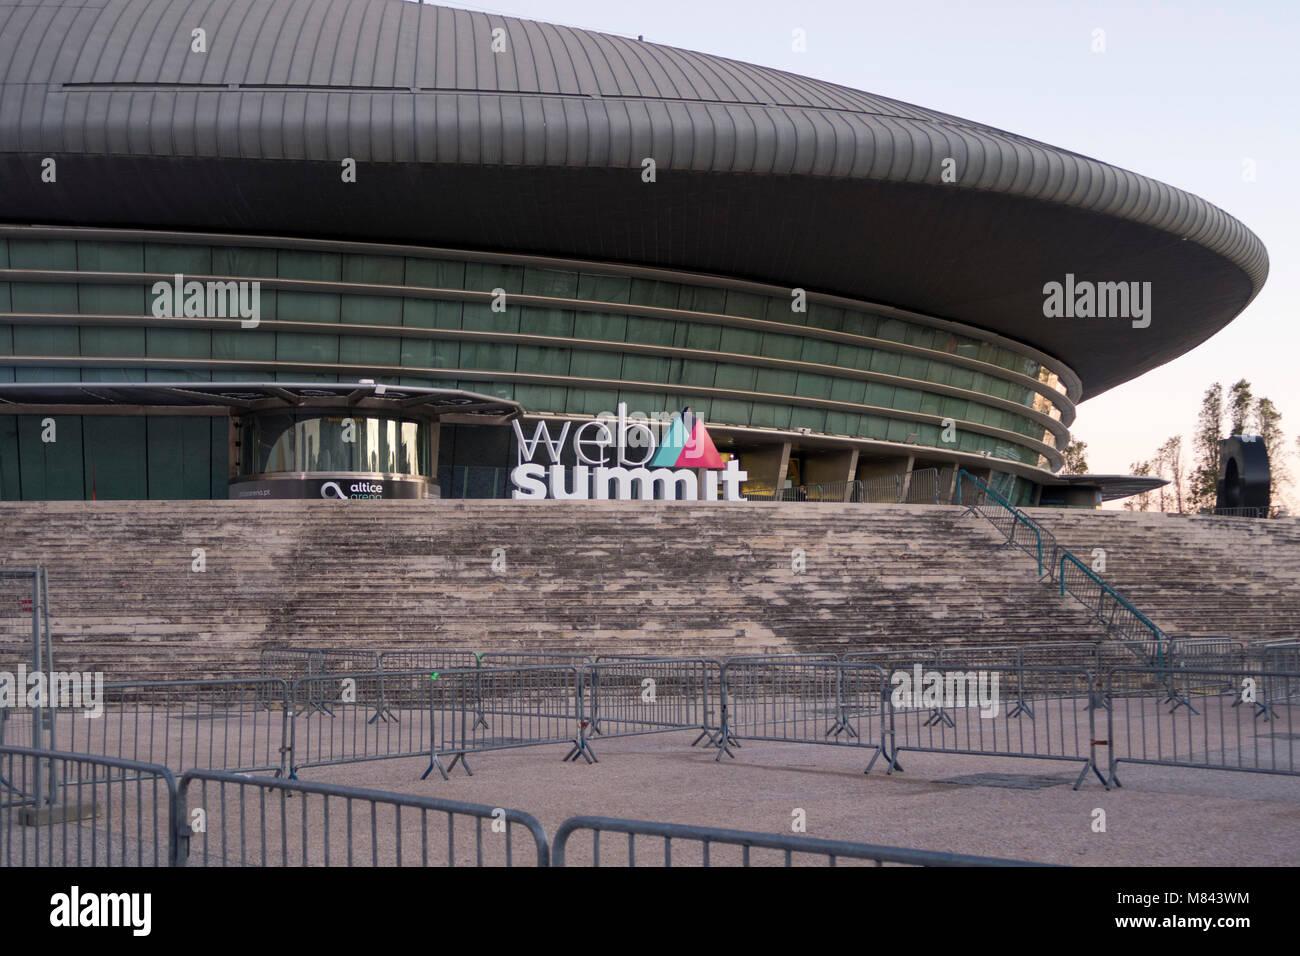 Web Gipfel Logo außerhalb des Altice Arena in Lissabon, Portugal, Europa Stockbild